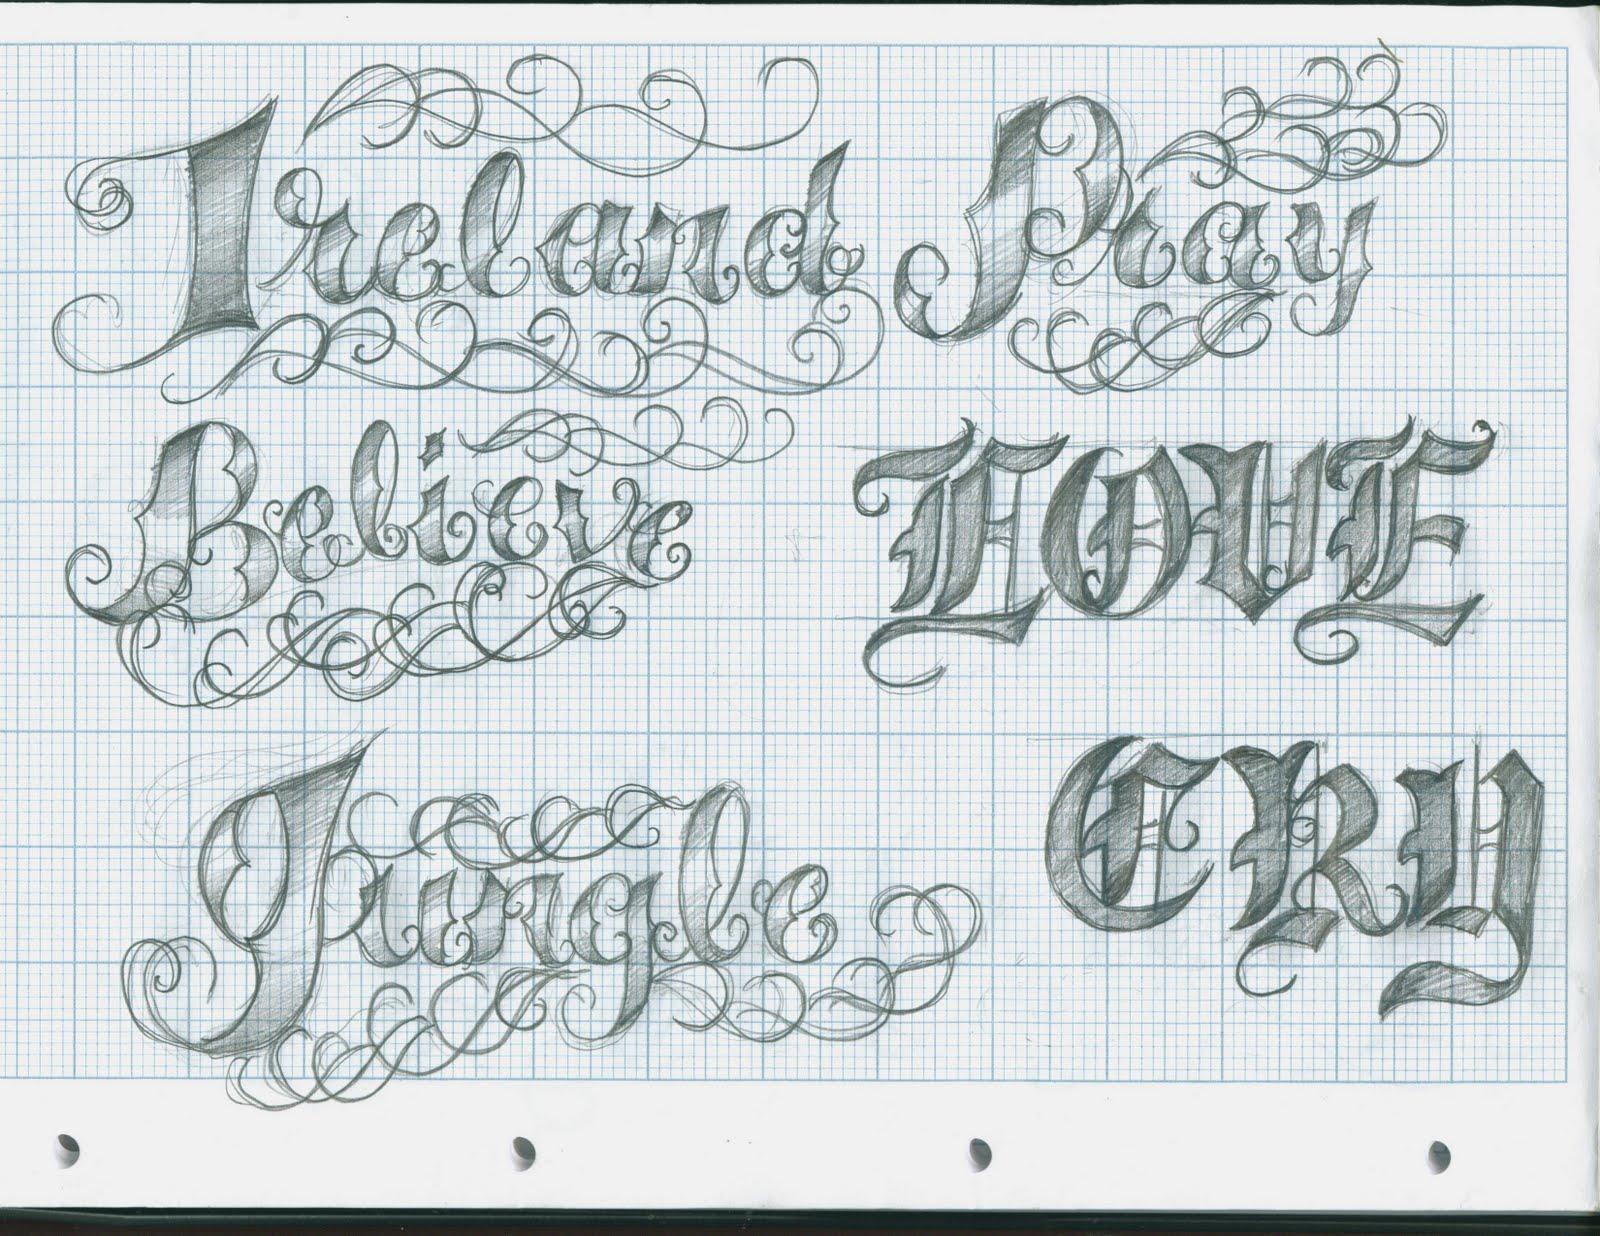 tattoo lettering2